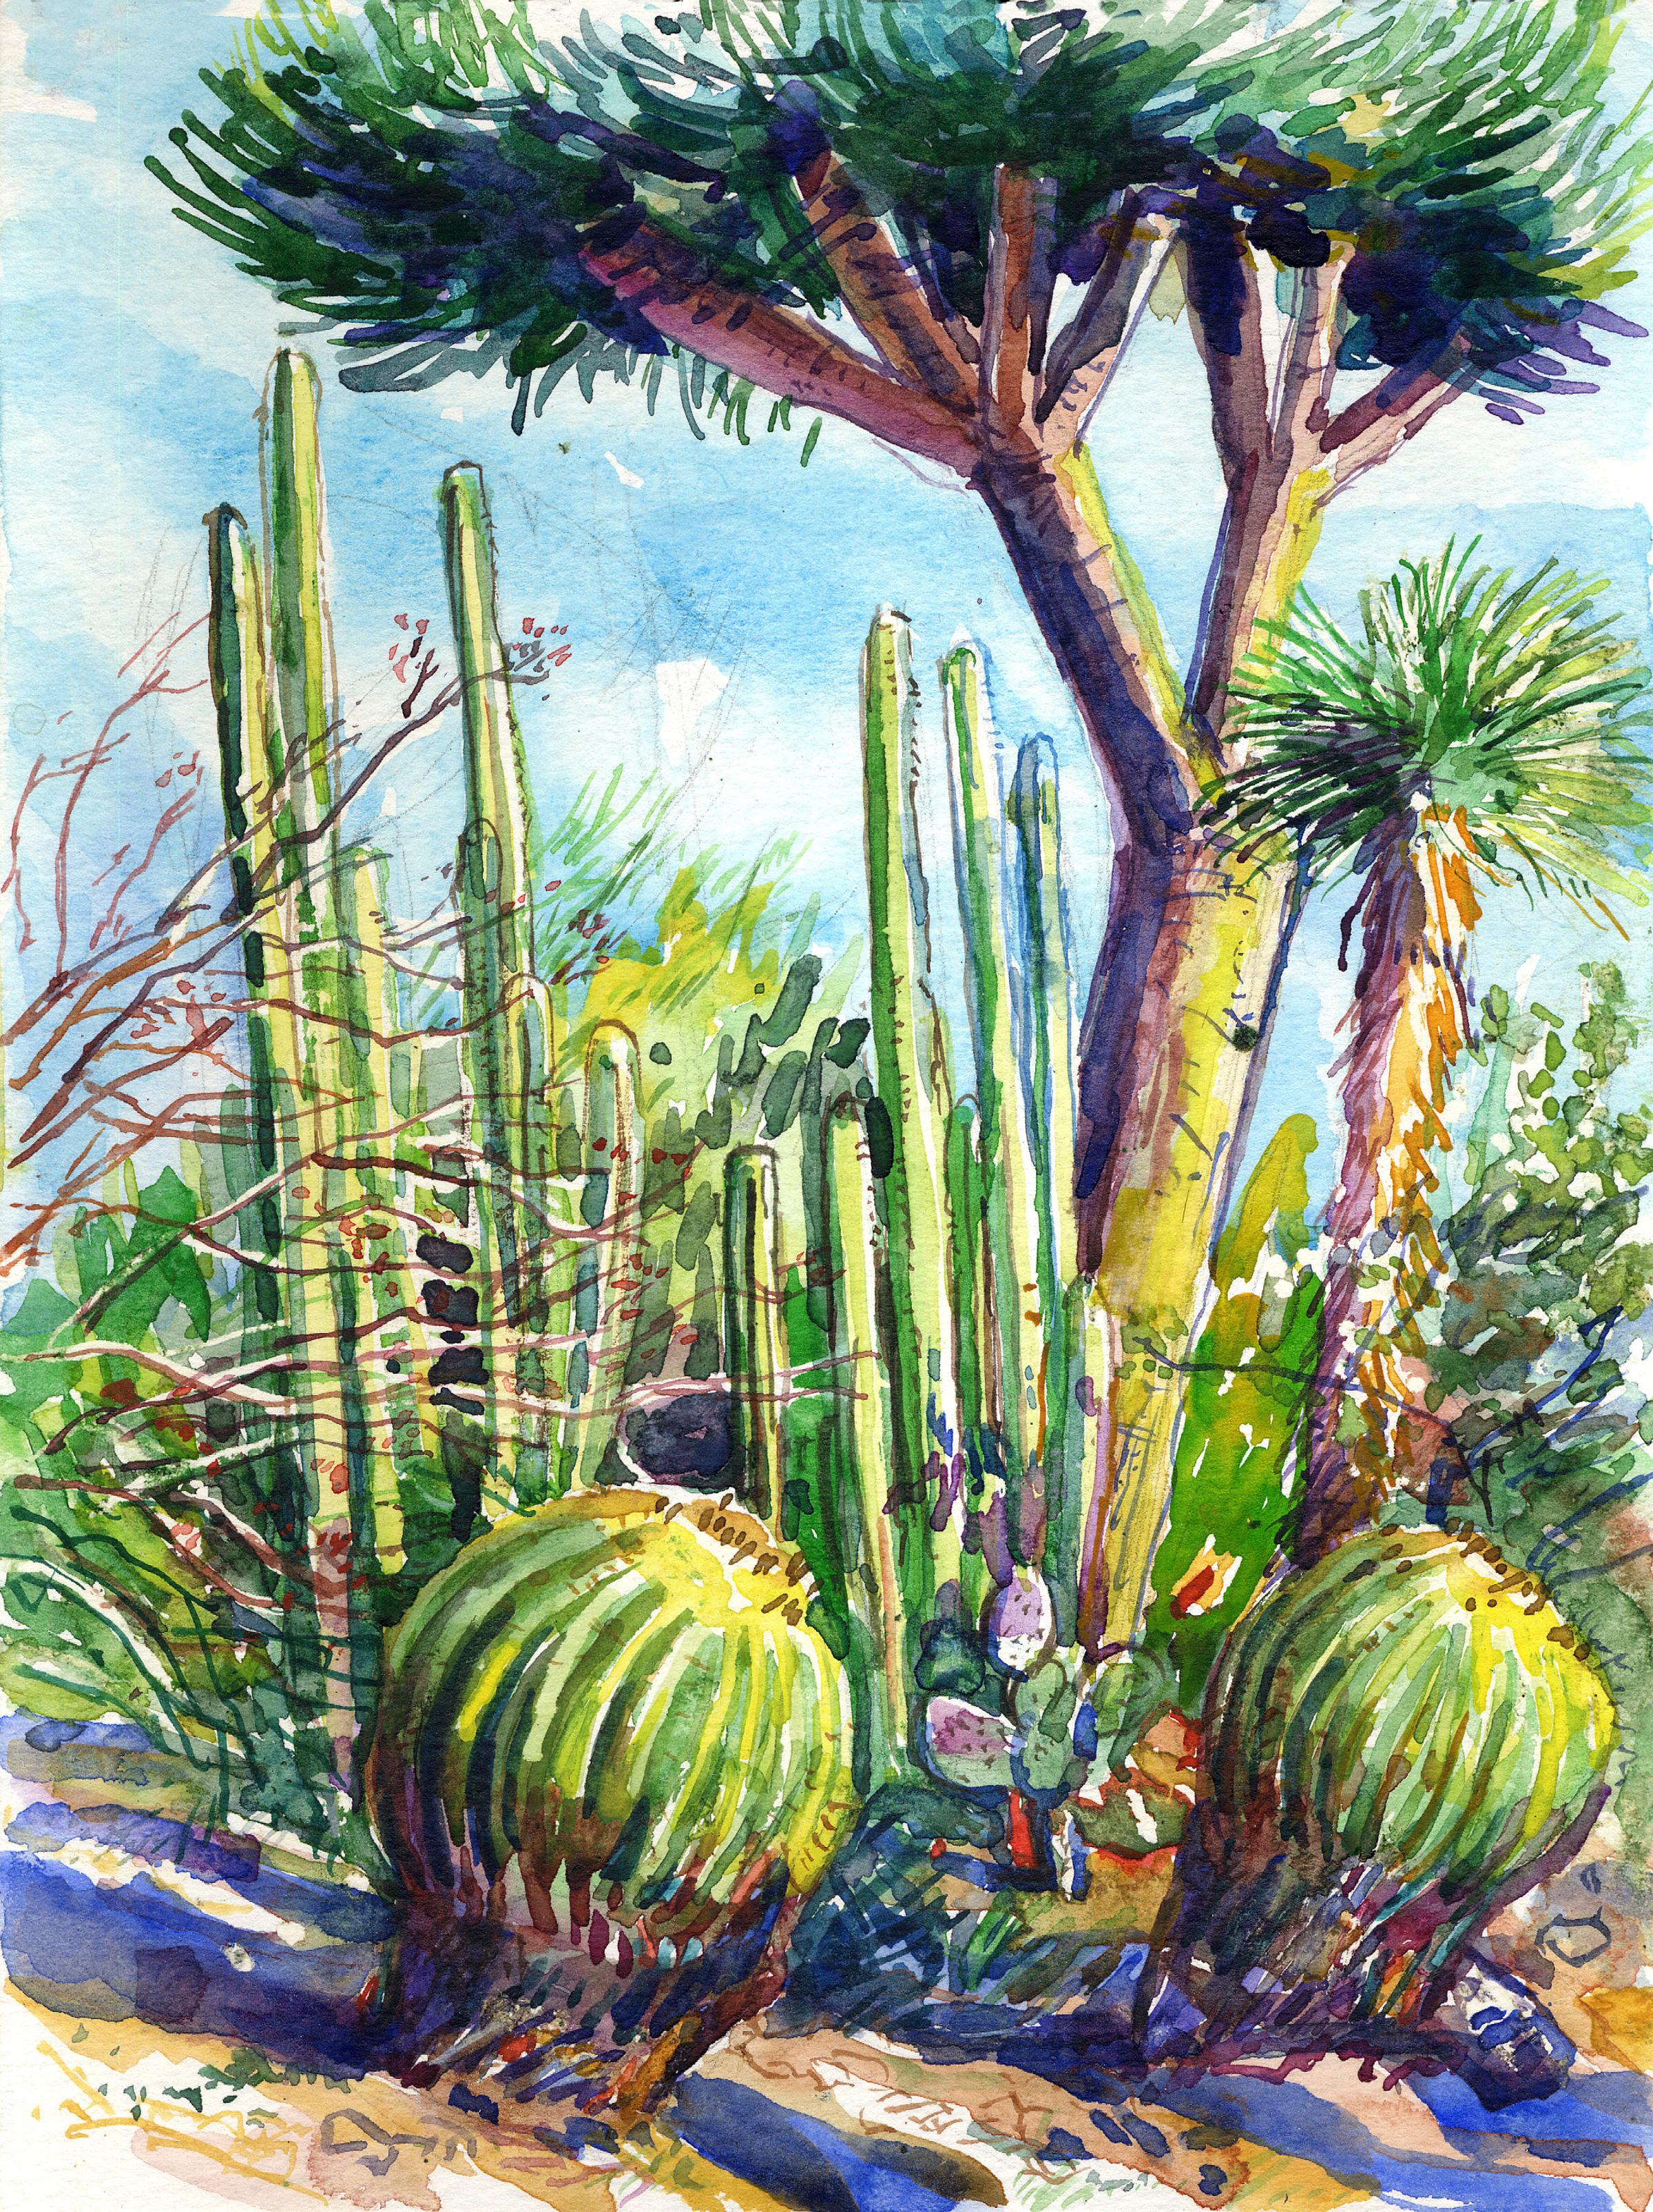 Barrel cactus & thorny tree